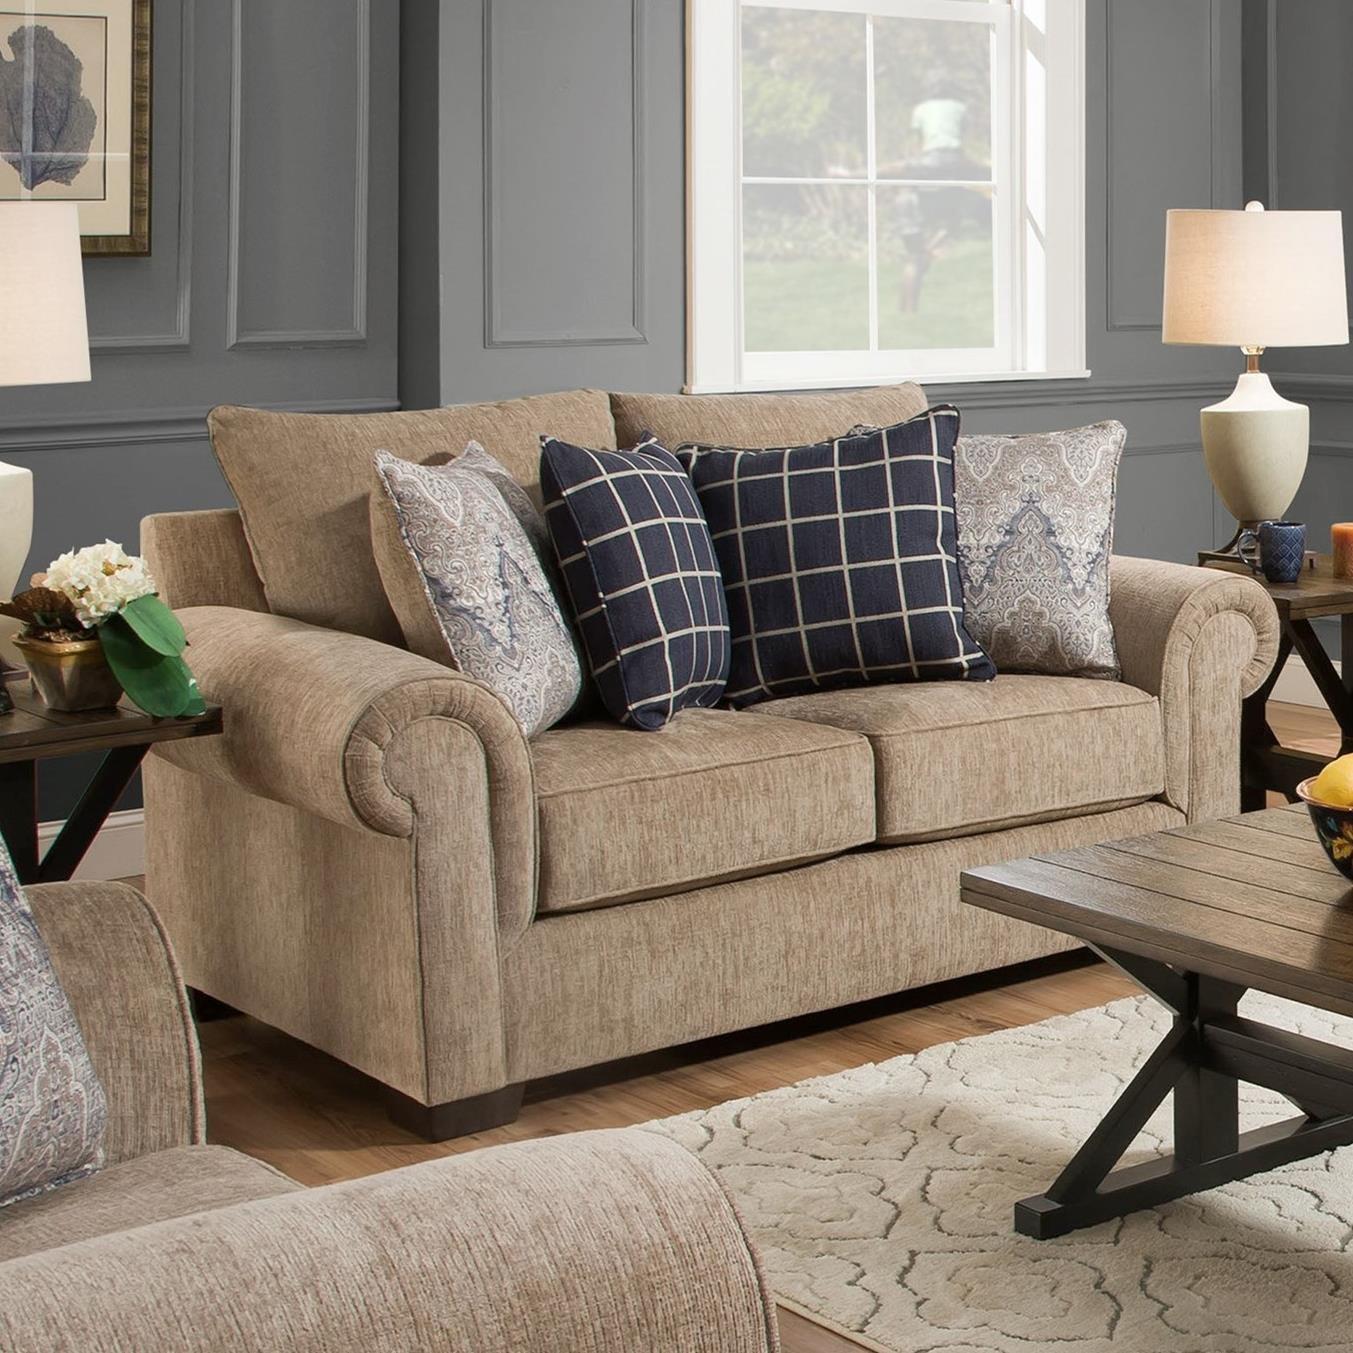 United Furniture Industries 6485 Transitional Loveseat: Transitional Loveseat With Rolled Arms By United Furniture